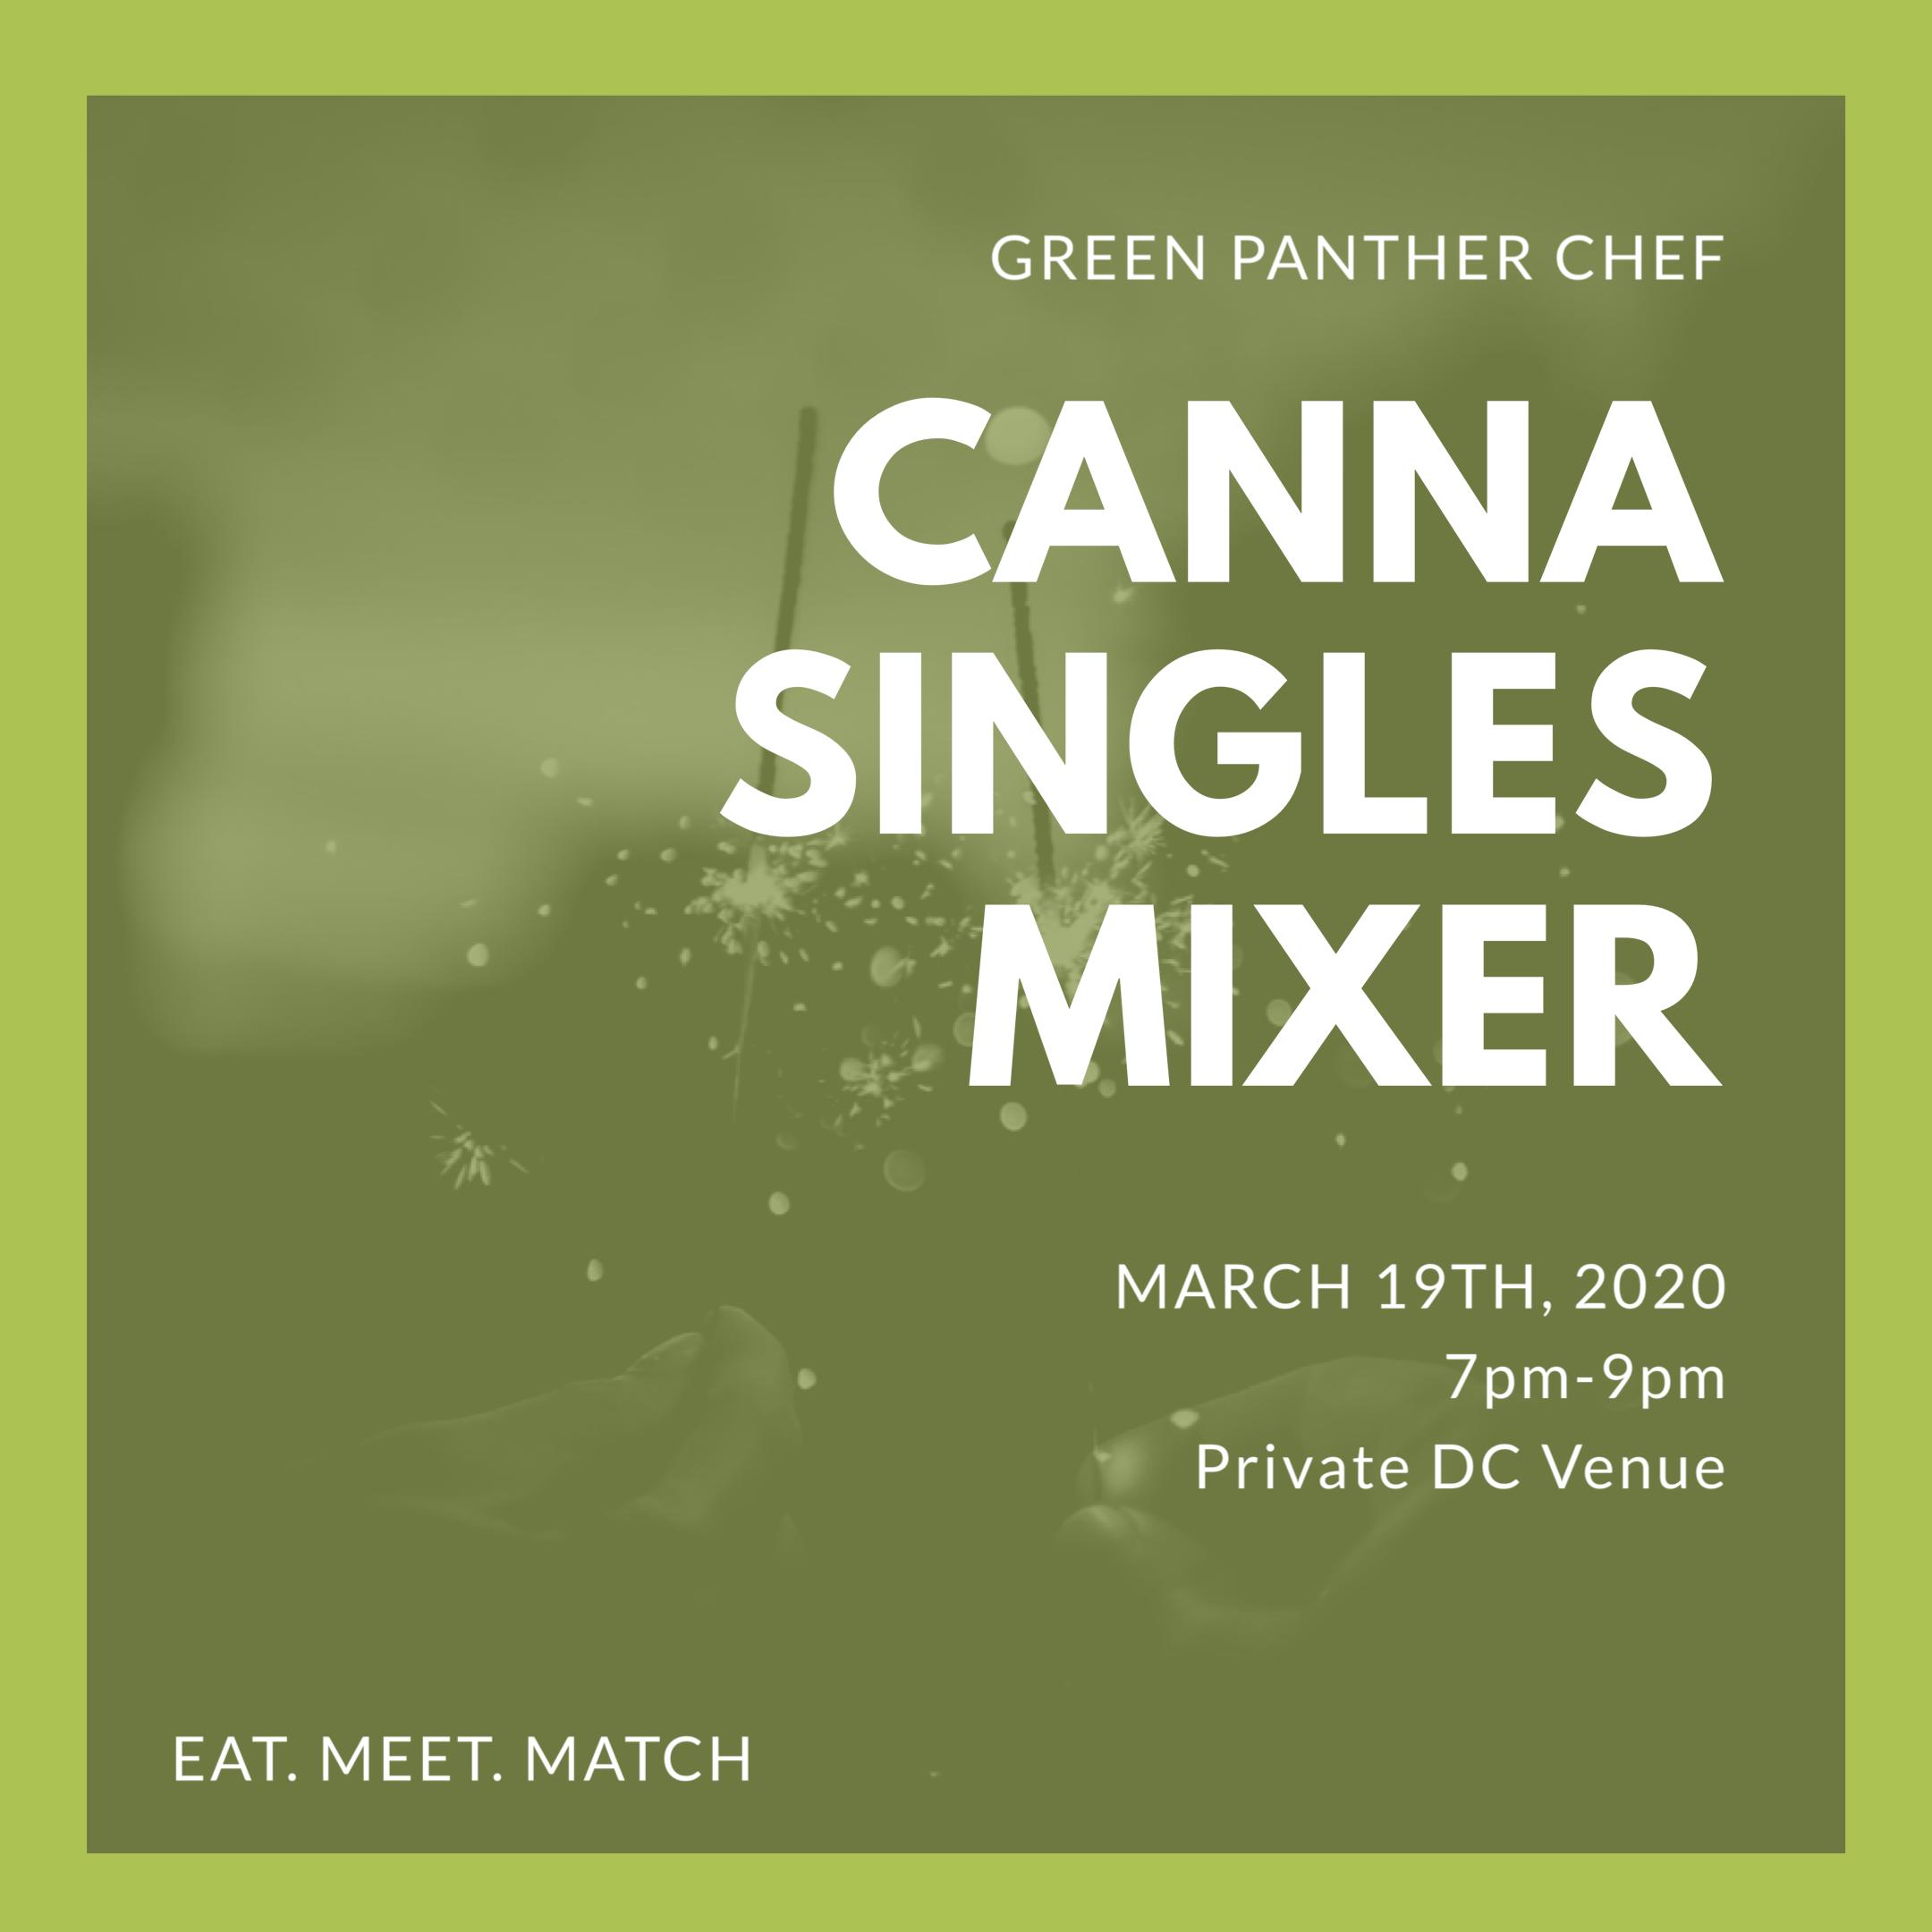 DMV Canna Singles Mixer